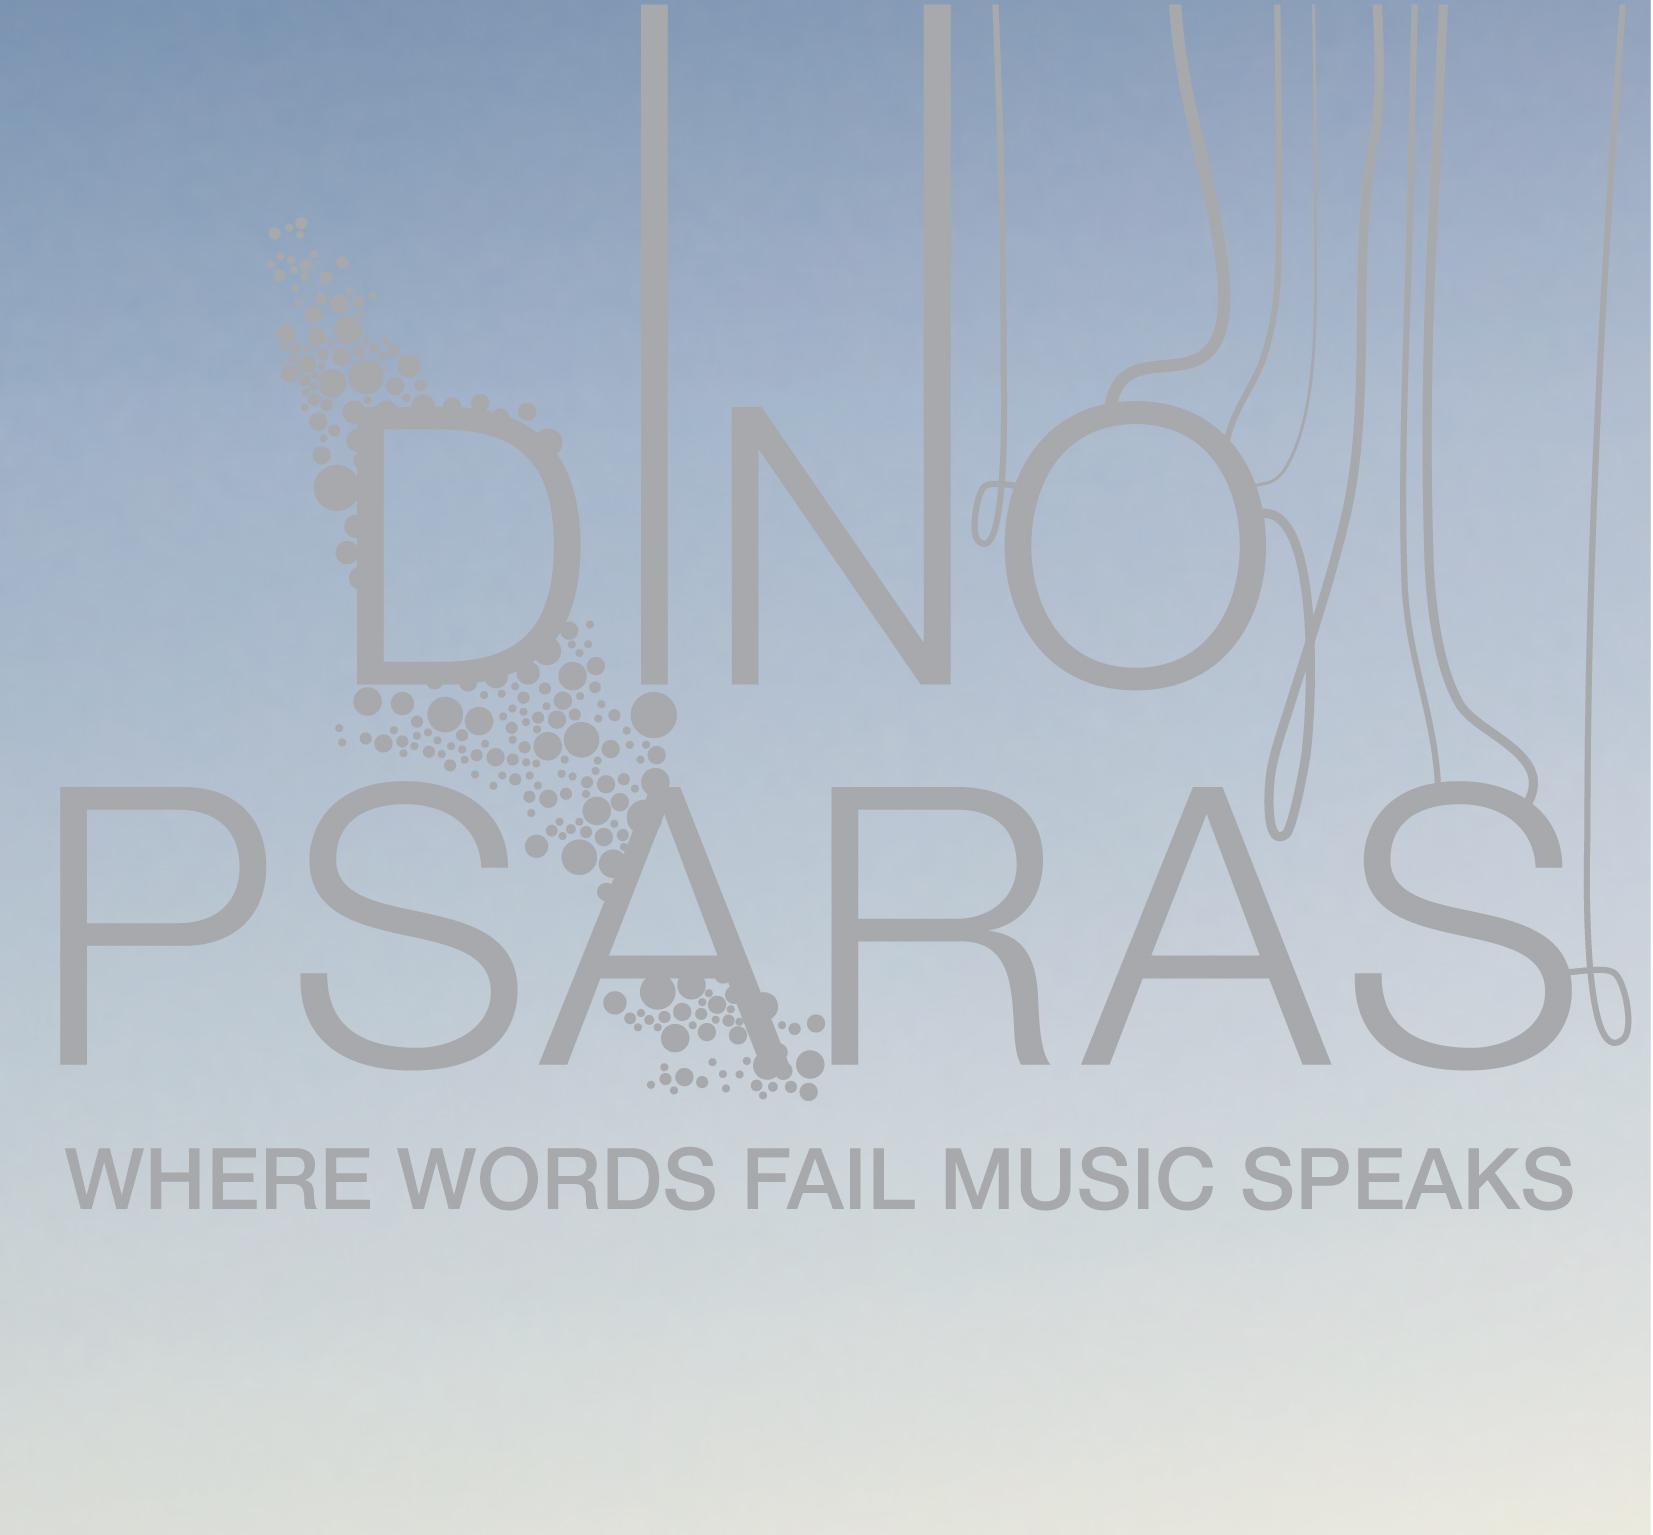 Dino Psaras - Where Words Fail Music Speaks - 2007